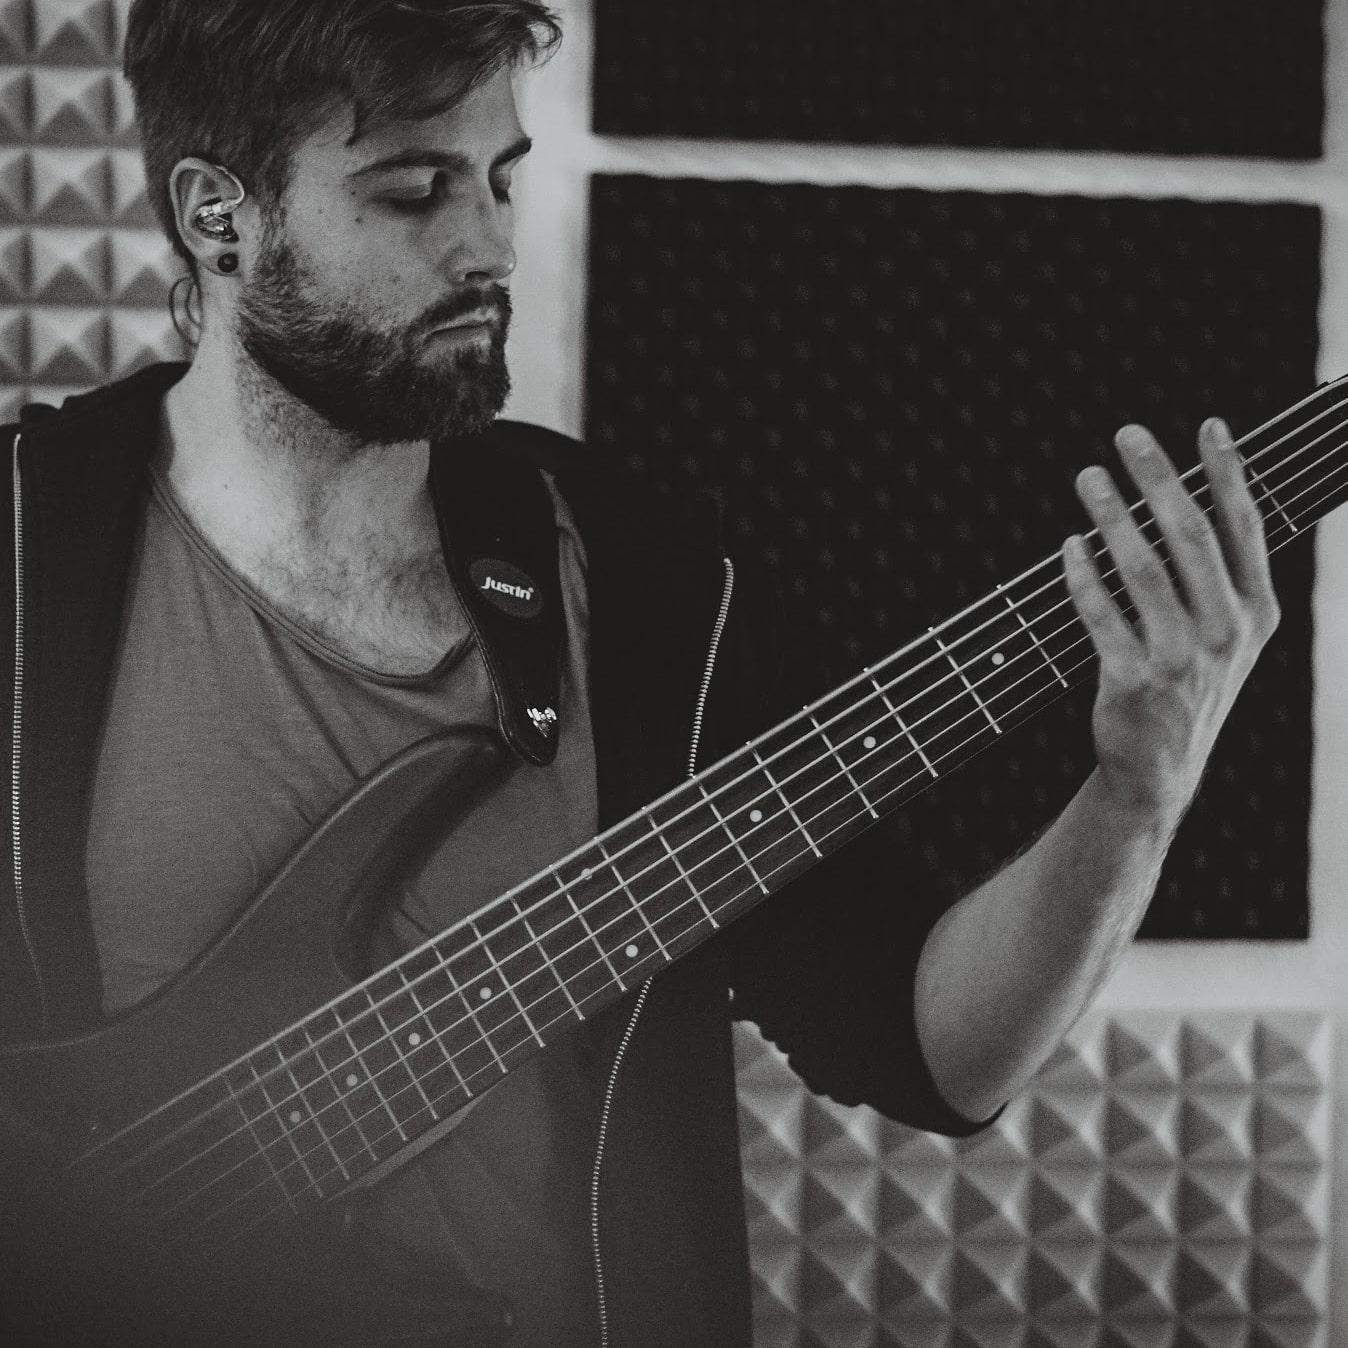 Nicolas Bräutigam